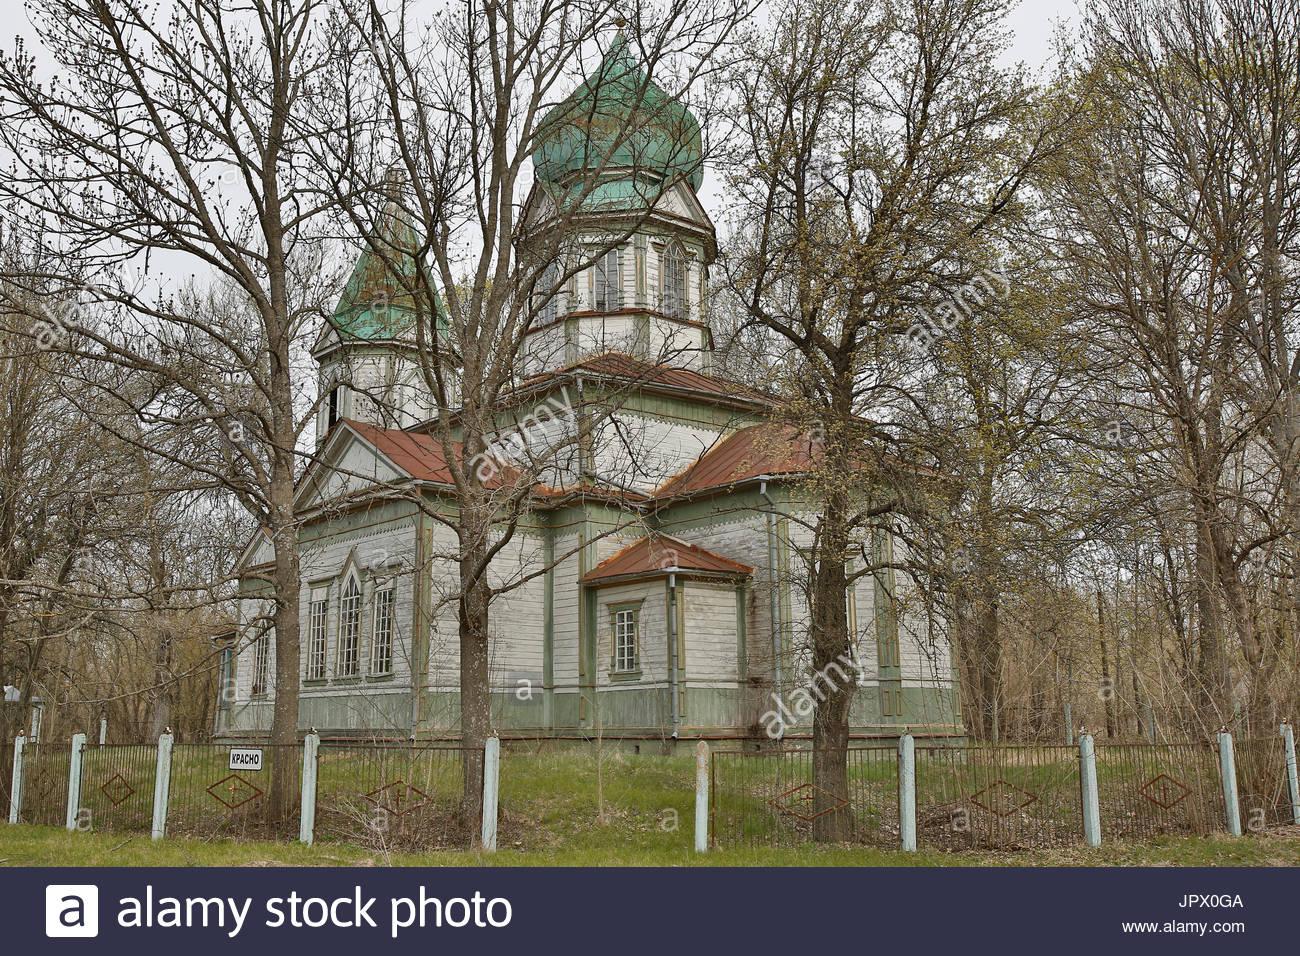 Abandoned church - Chernobyl Area Ukraine - Stock Image